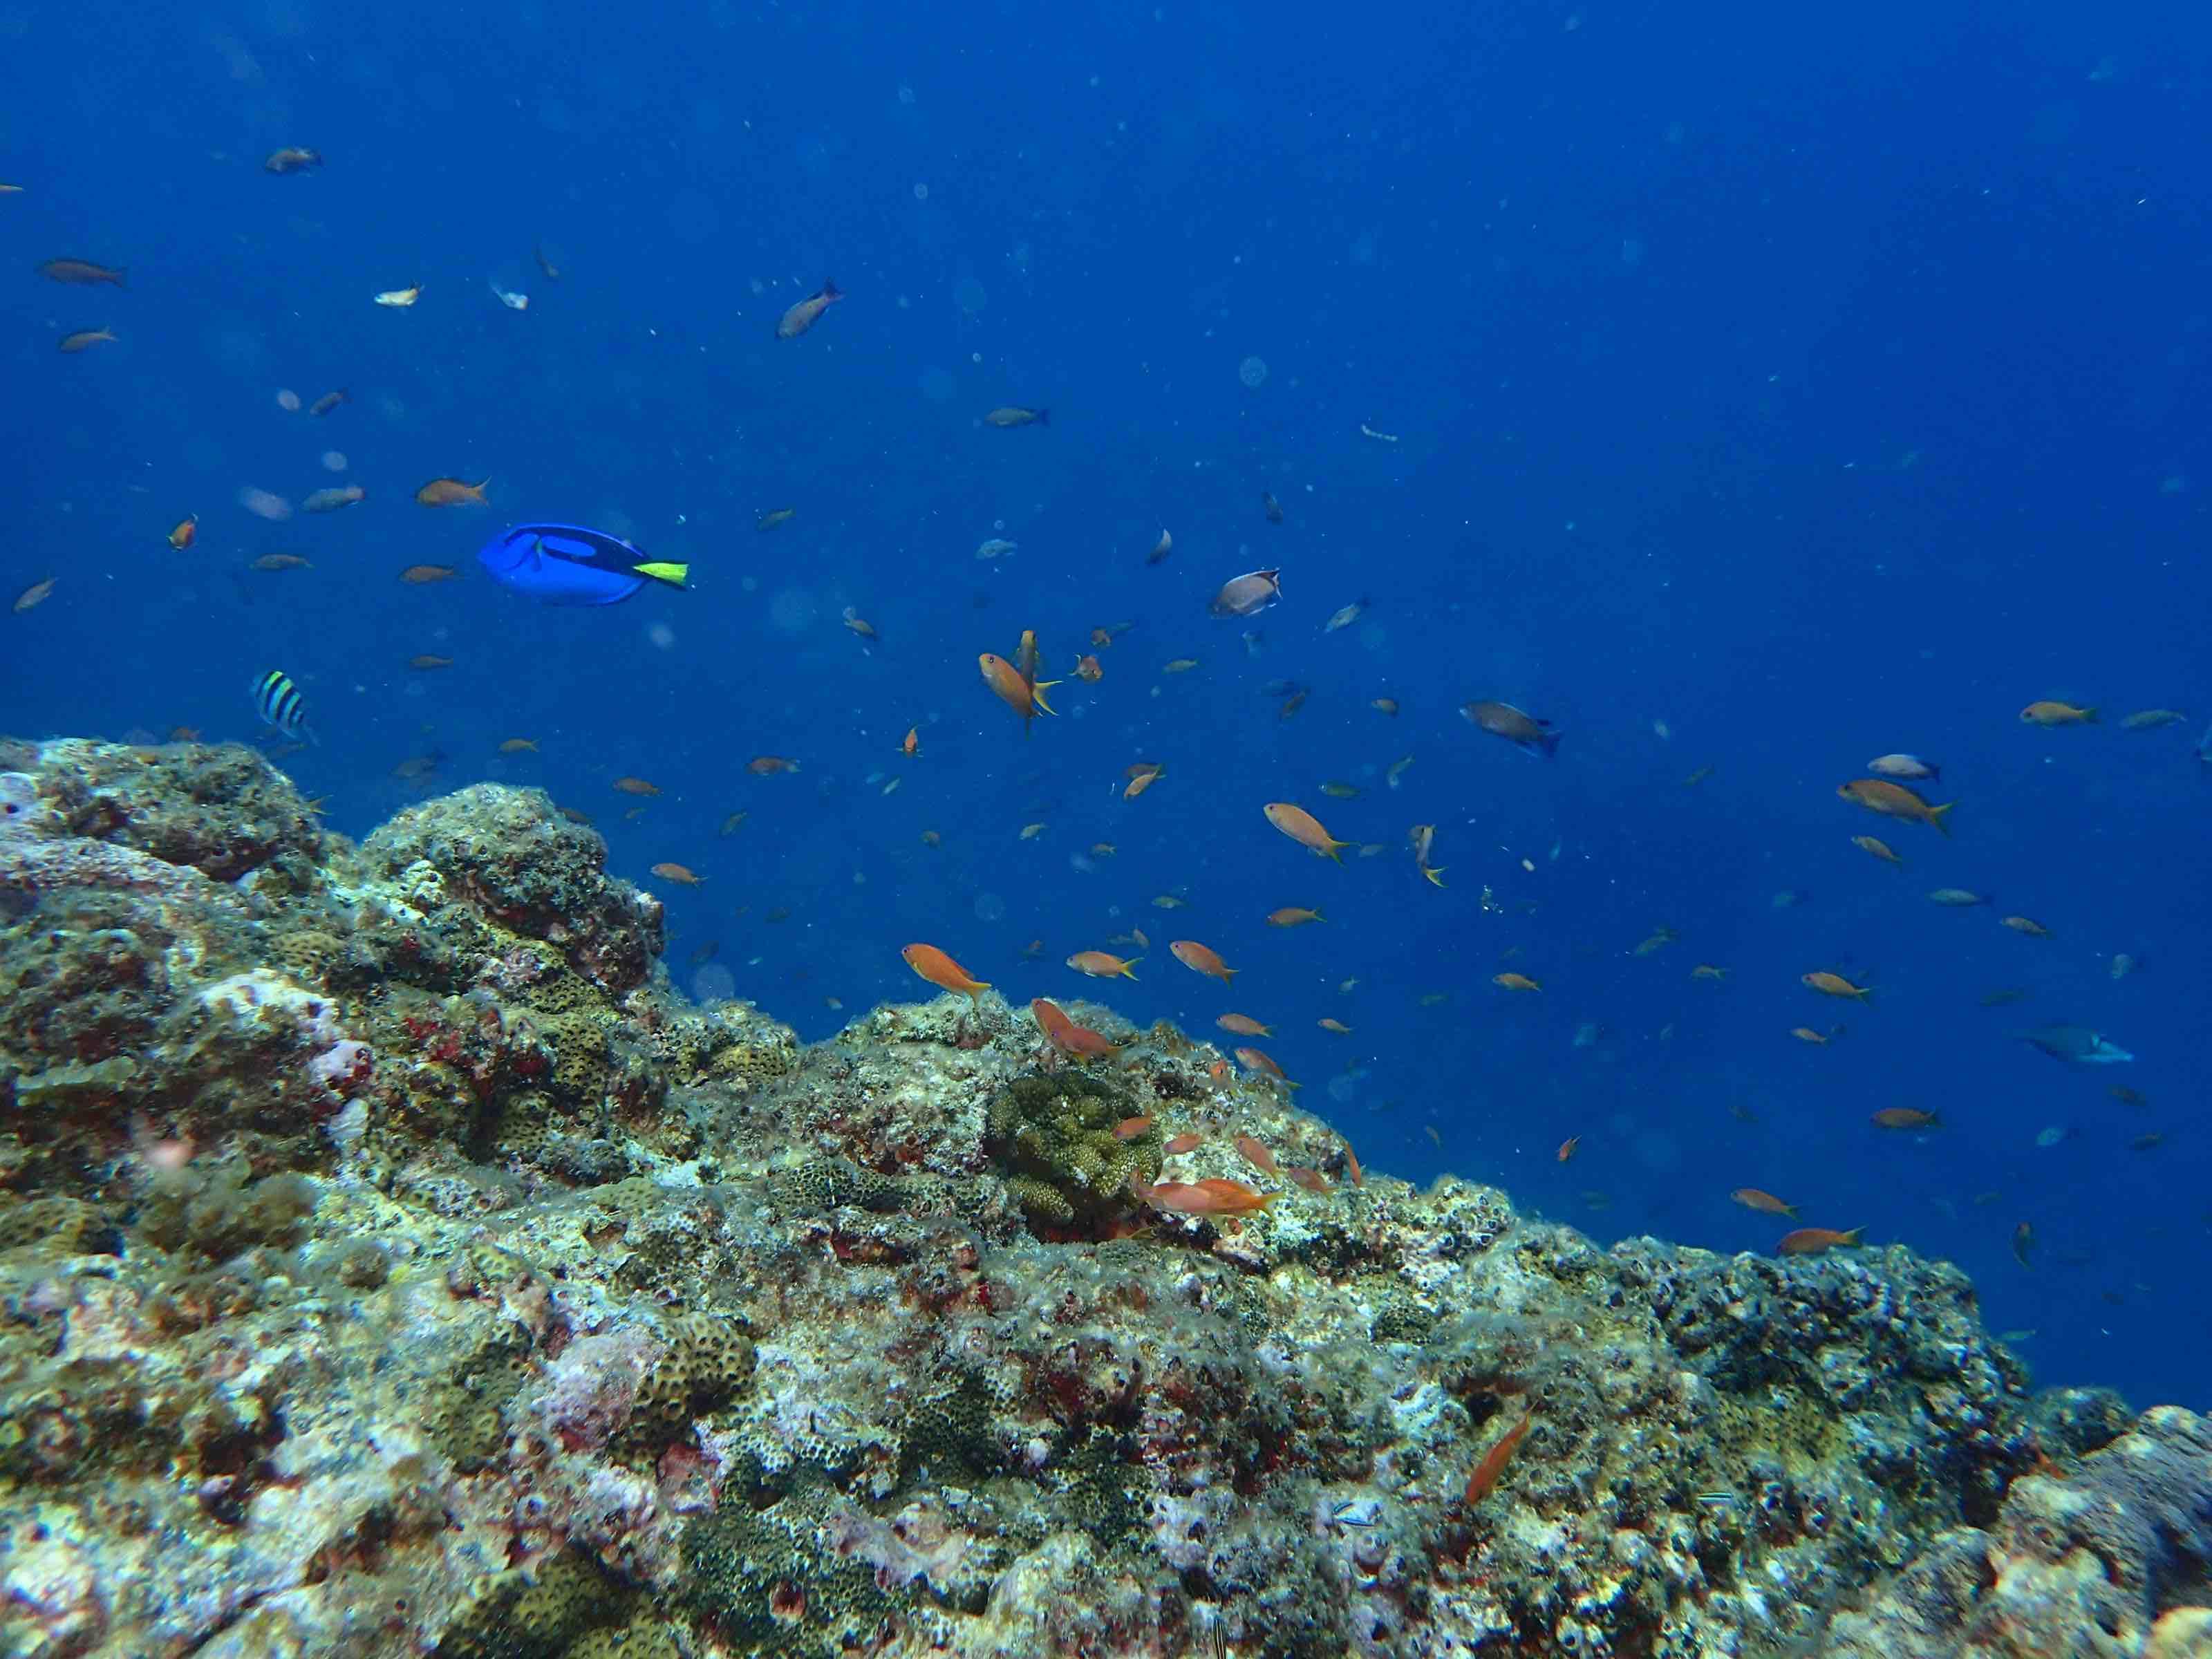 http://www.aquamarine-dive.net/blog/index.html/2017/07/18/P7151011.jpg